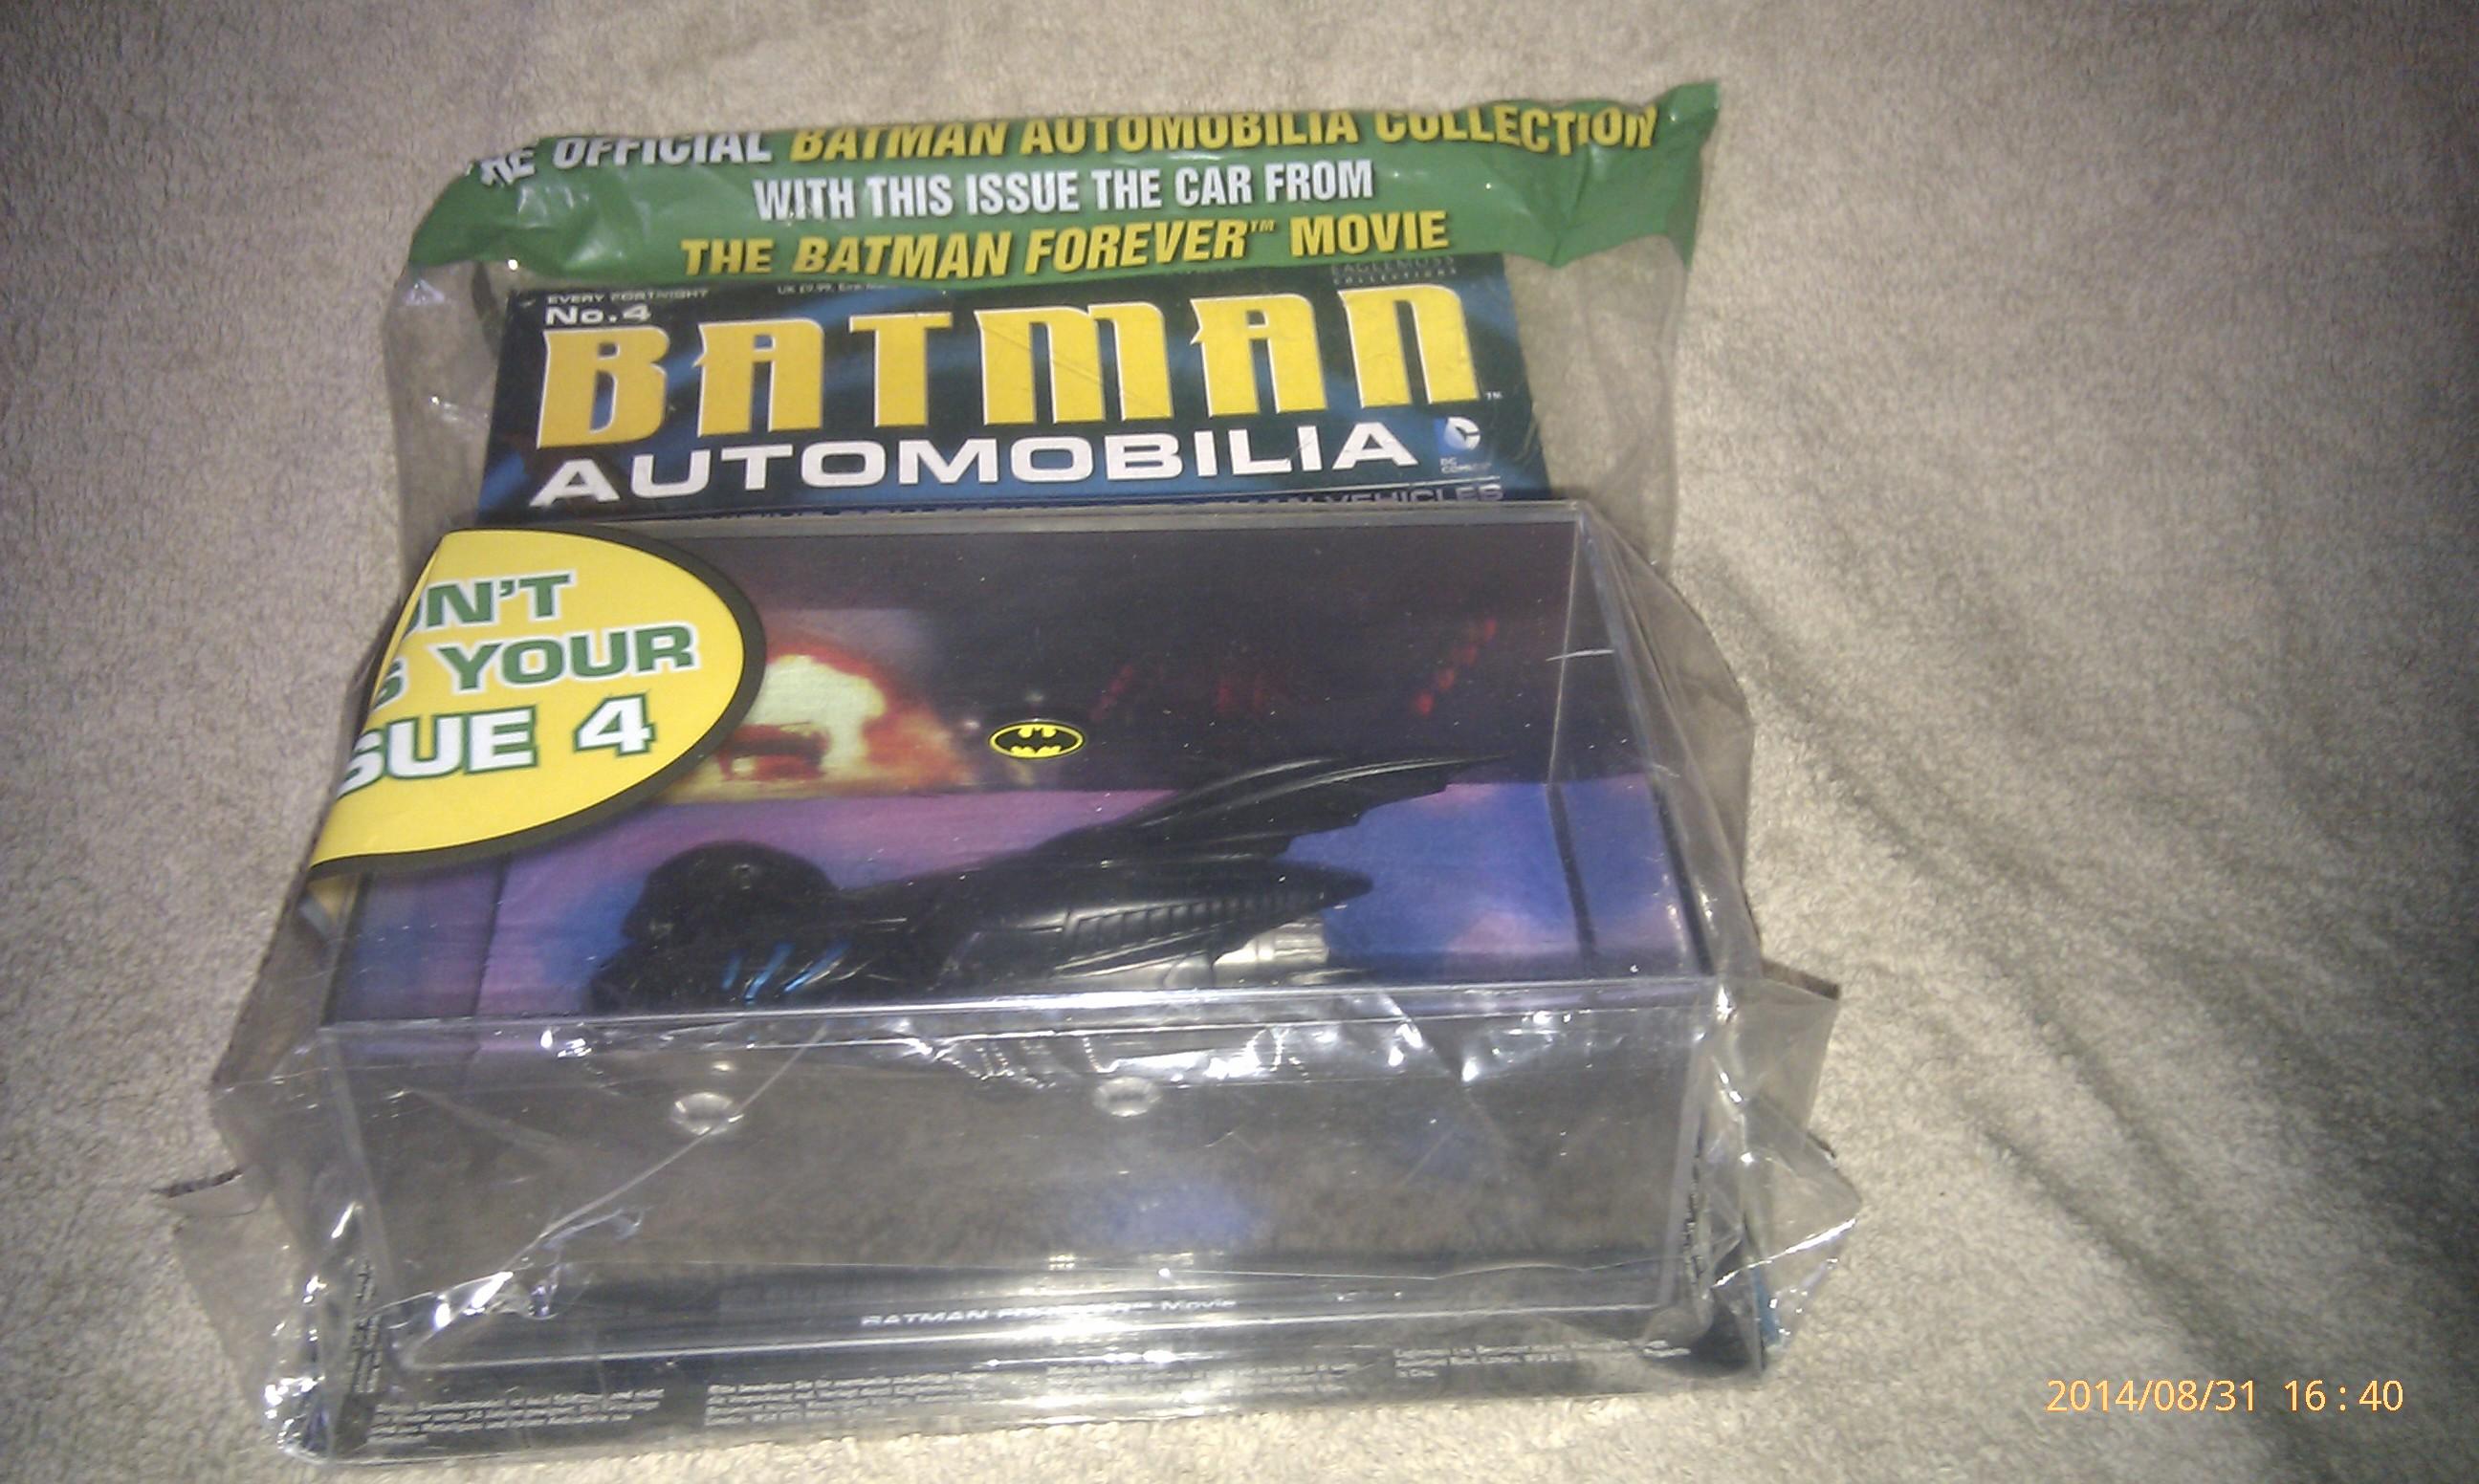 Batman Automobilia 4 - Batman Forever Movie